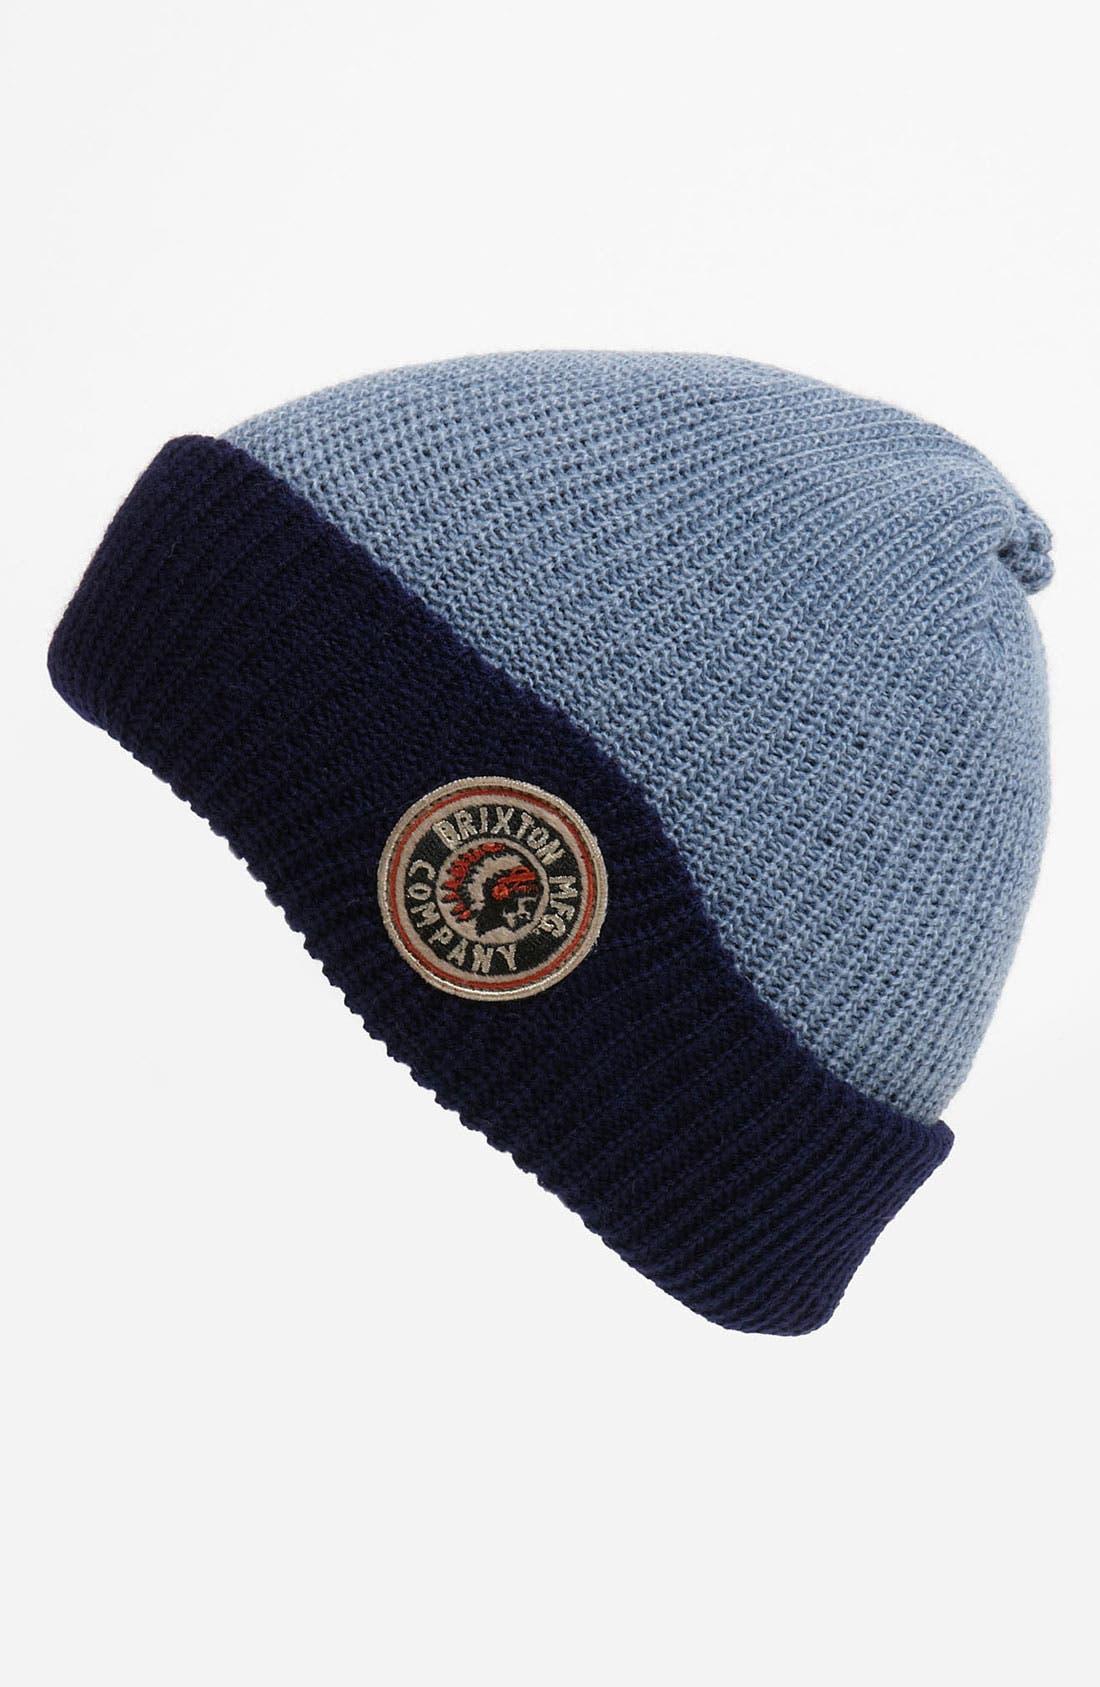 Alternate Image 1 Selected - Brixton 'Saint' Knit Cap